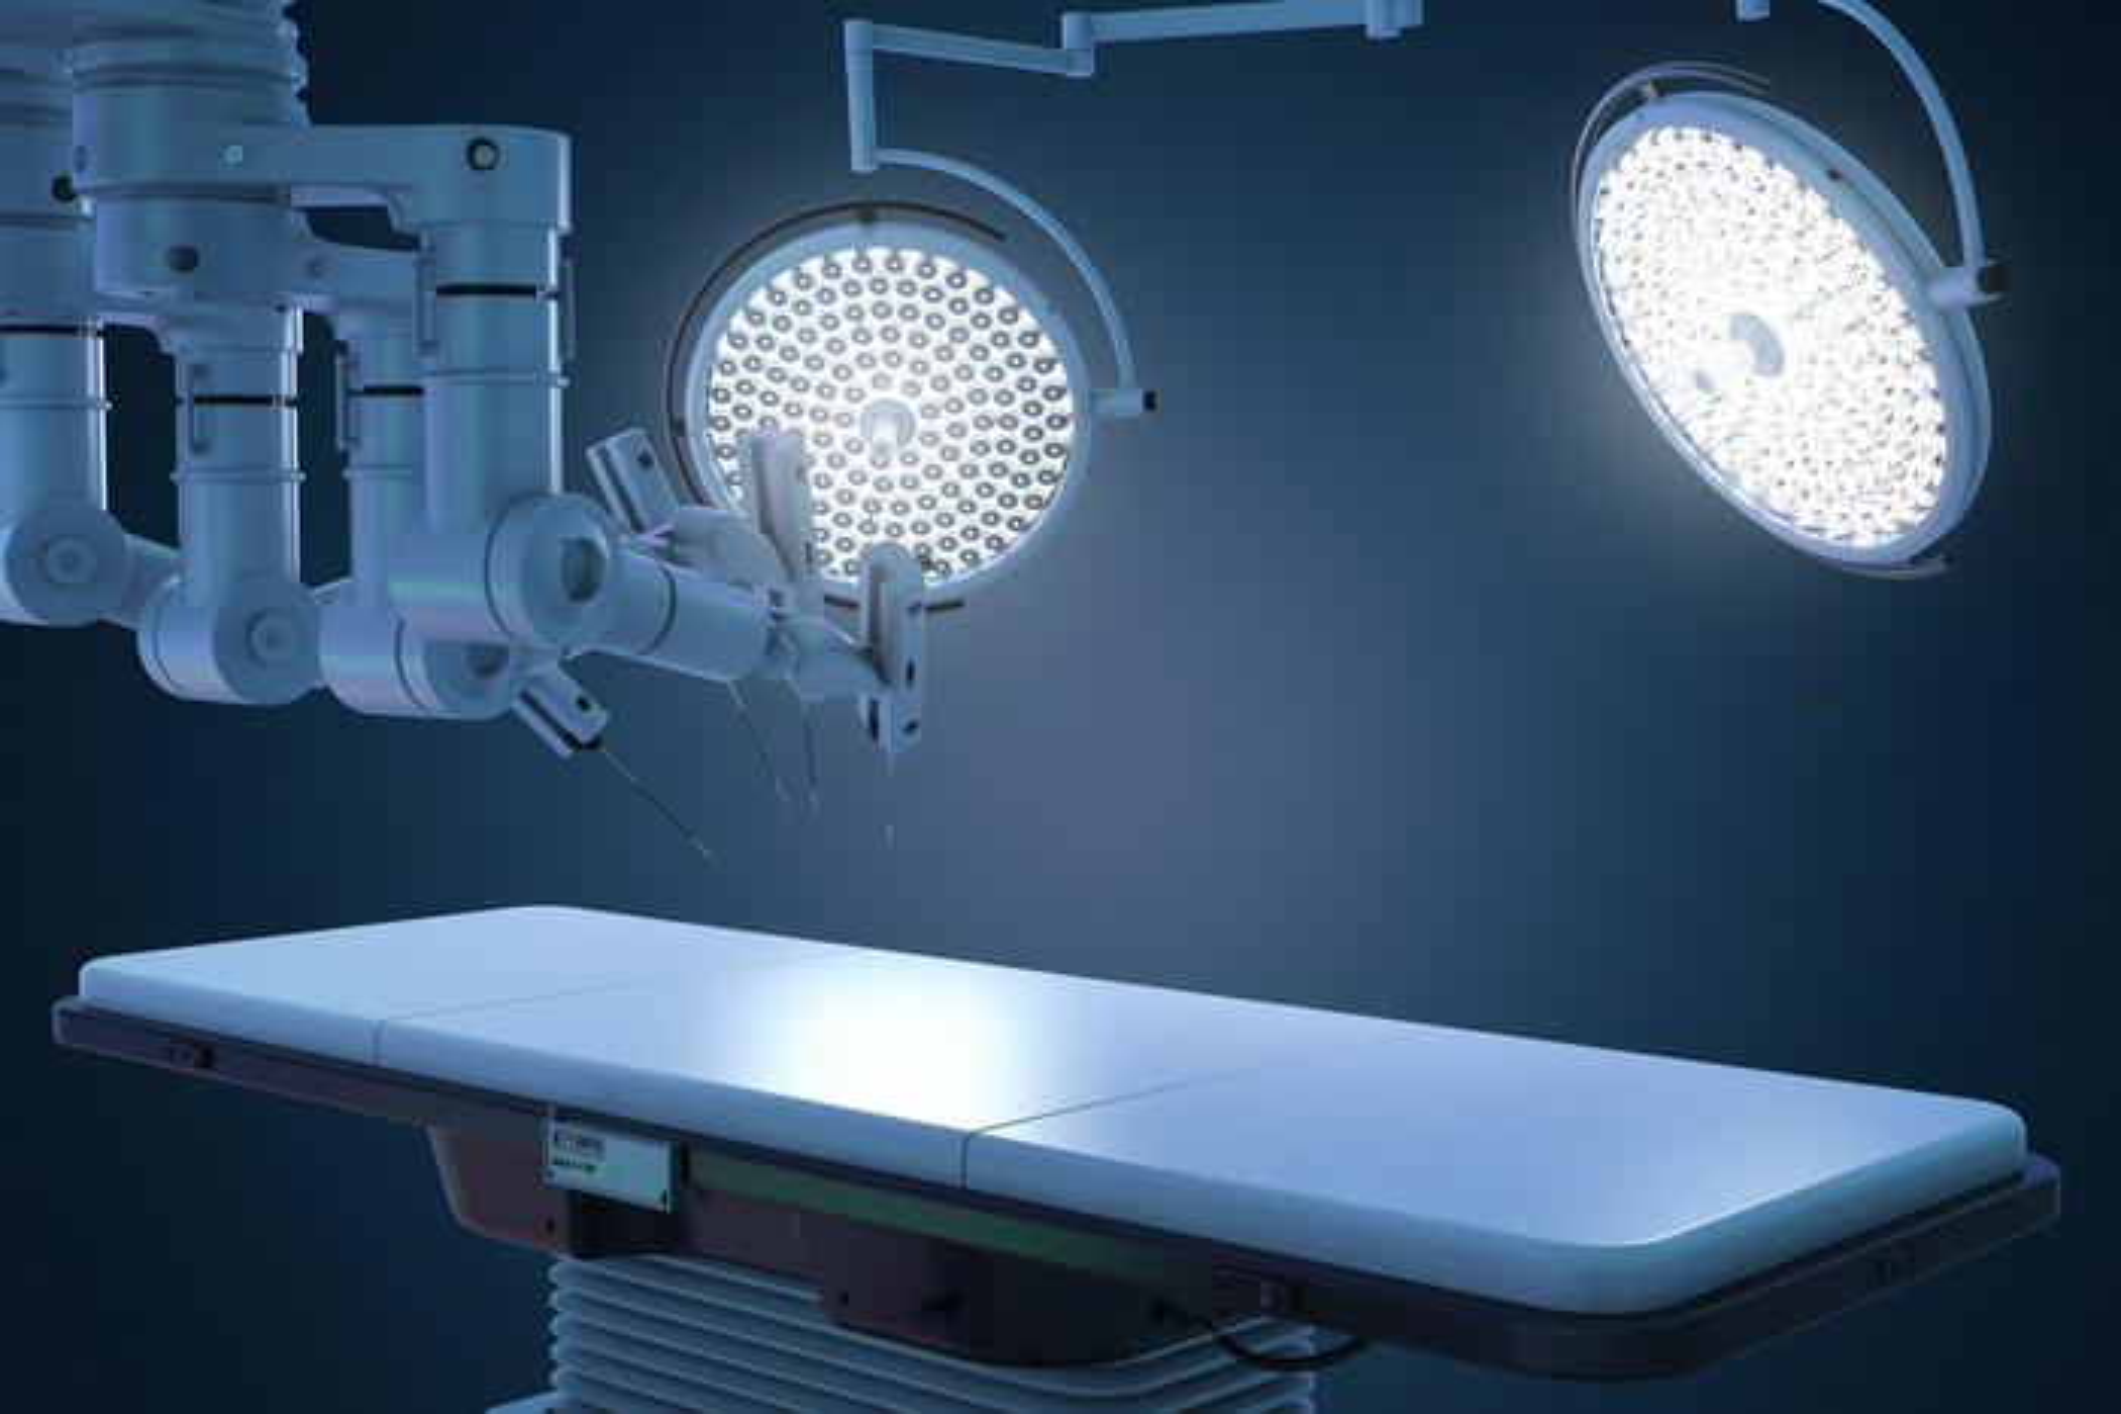 Surgical table, lighting, and robot